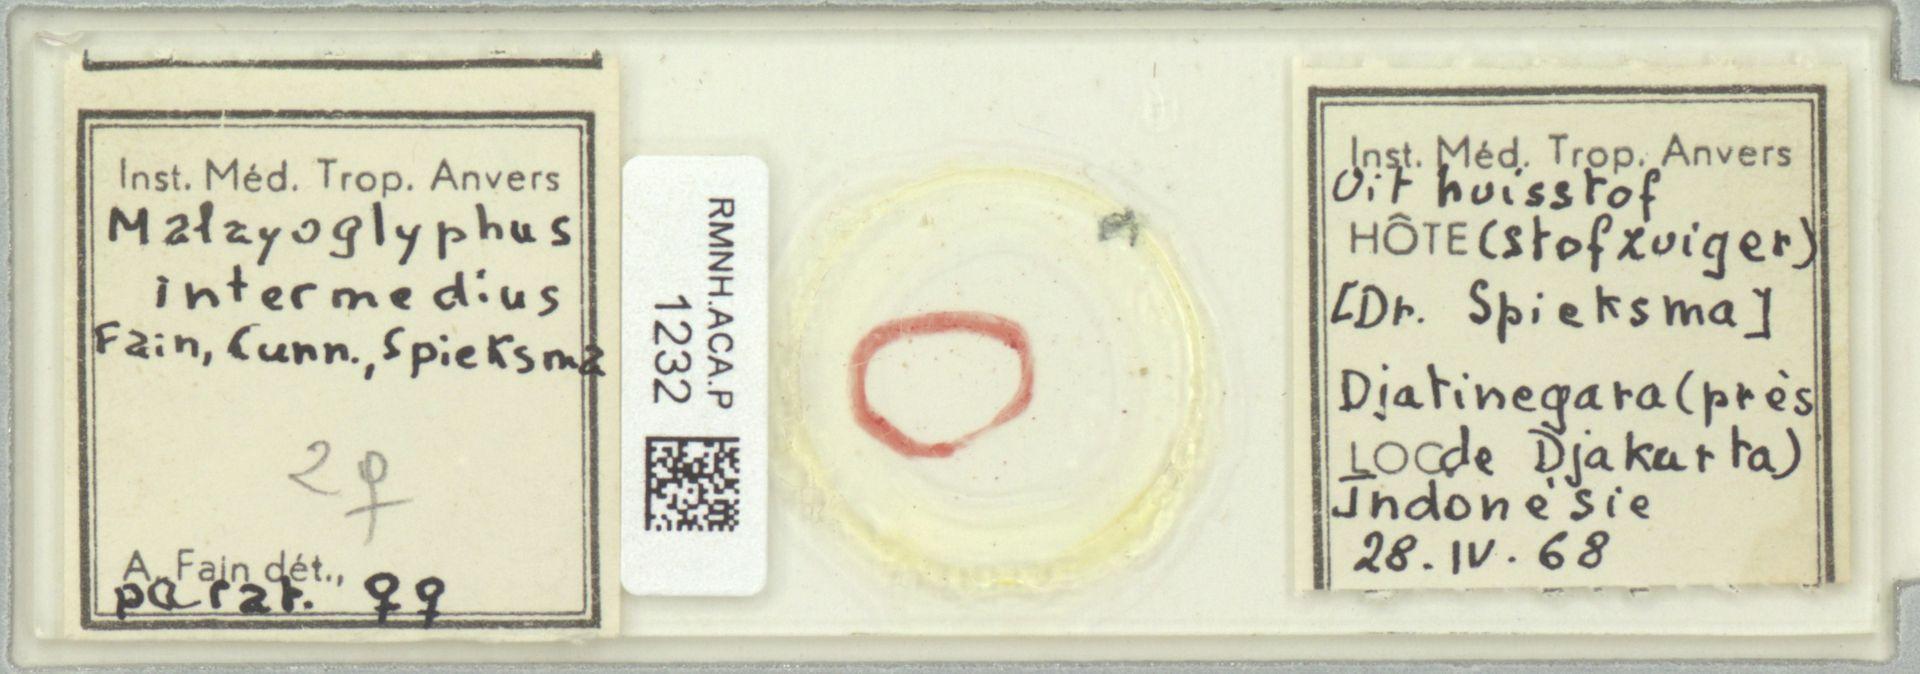 RMNH.ACA.P.1232 | Malayoglyphus intermedius Fain, Cunn., Spieksma